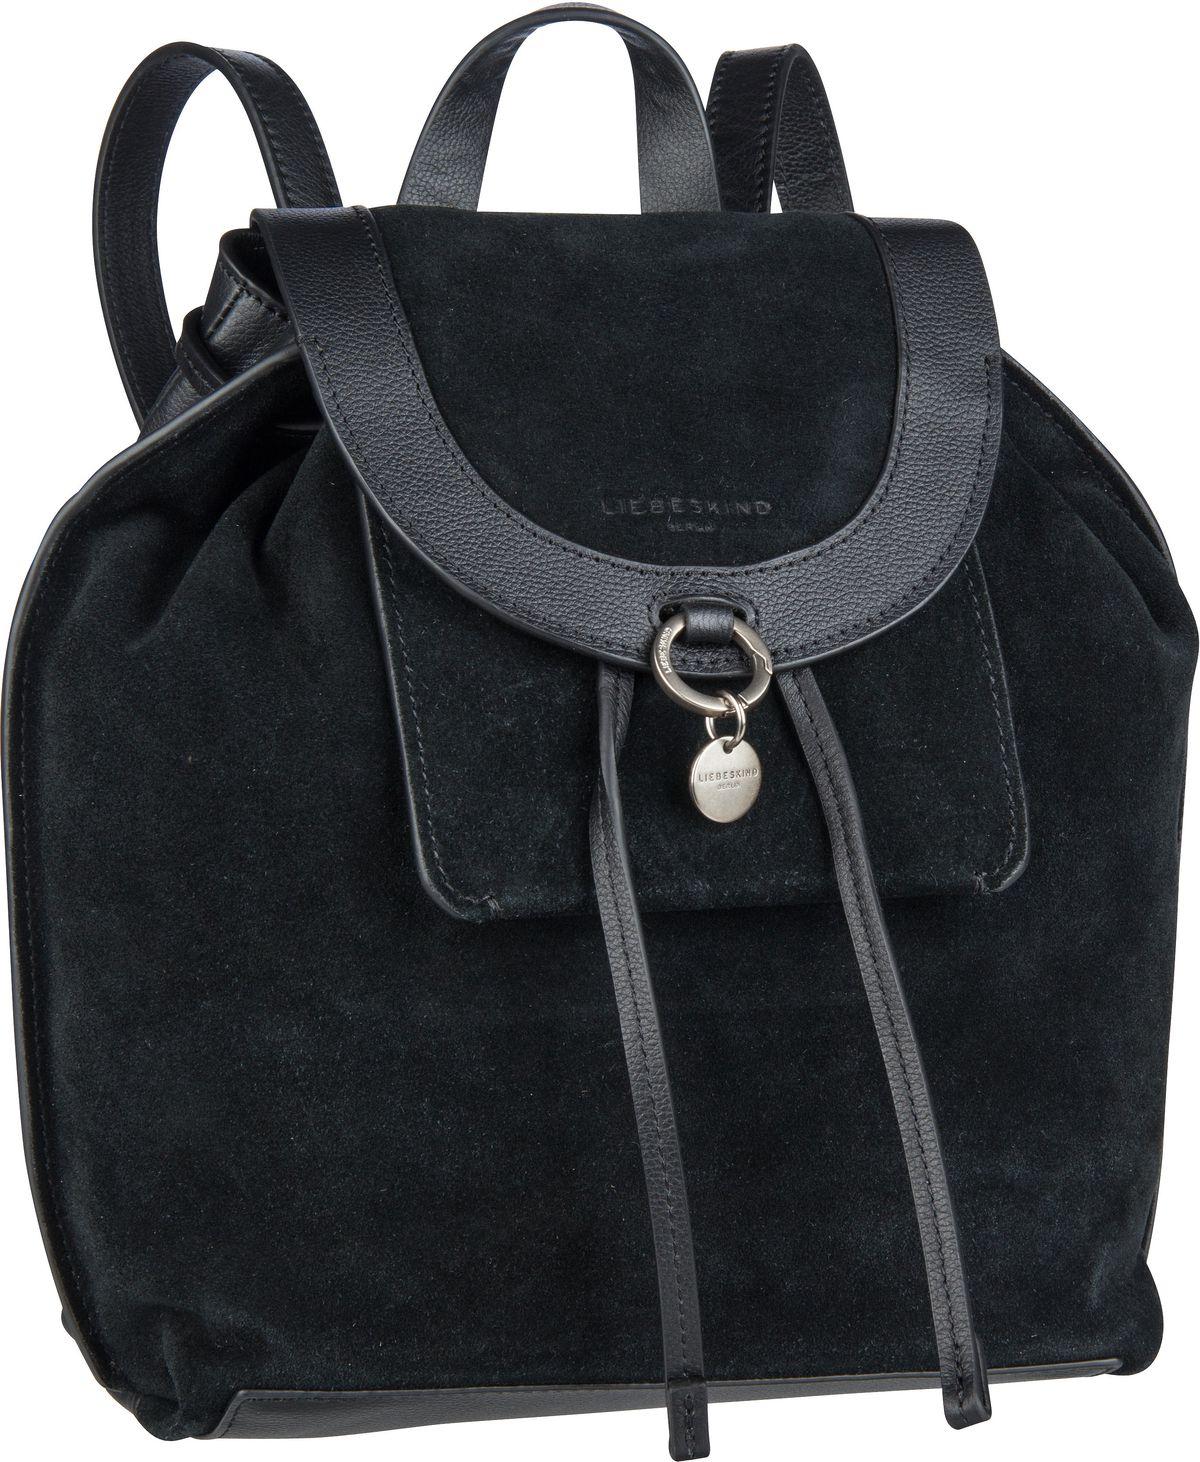 Berlin Rucksack / Daypack Scouri 2 Backpack M Black